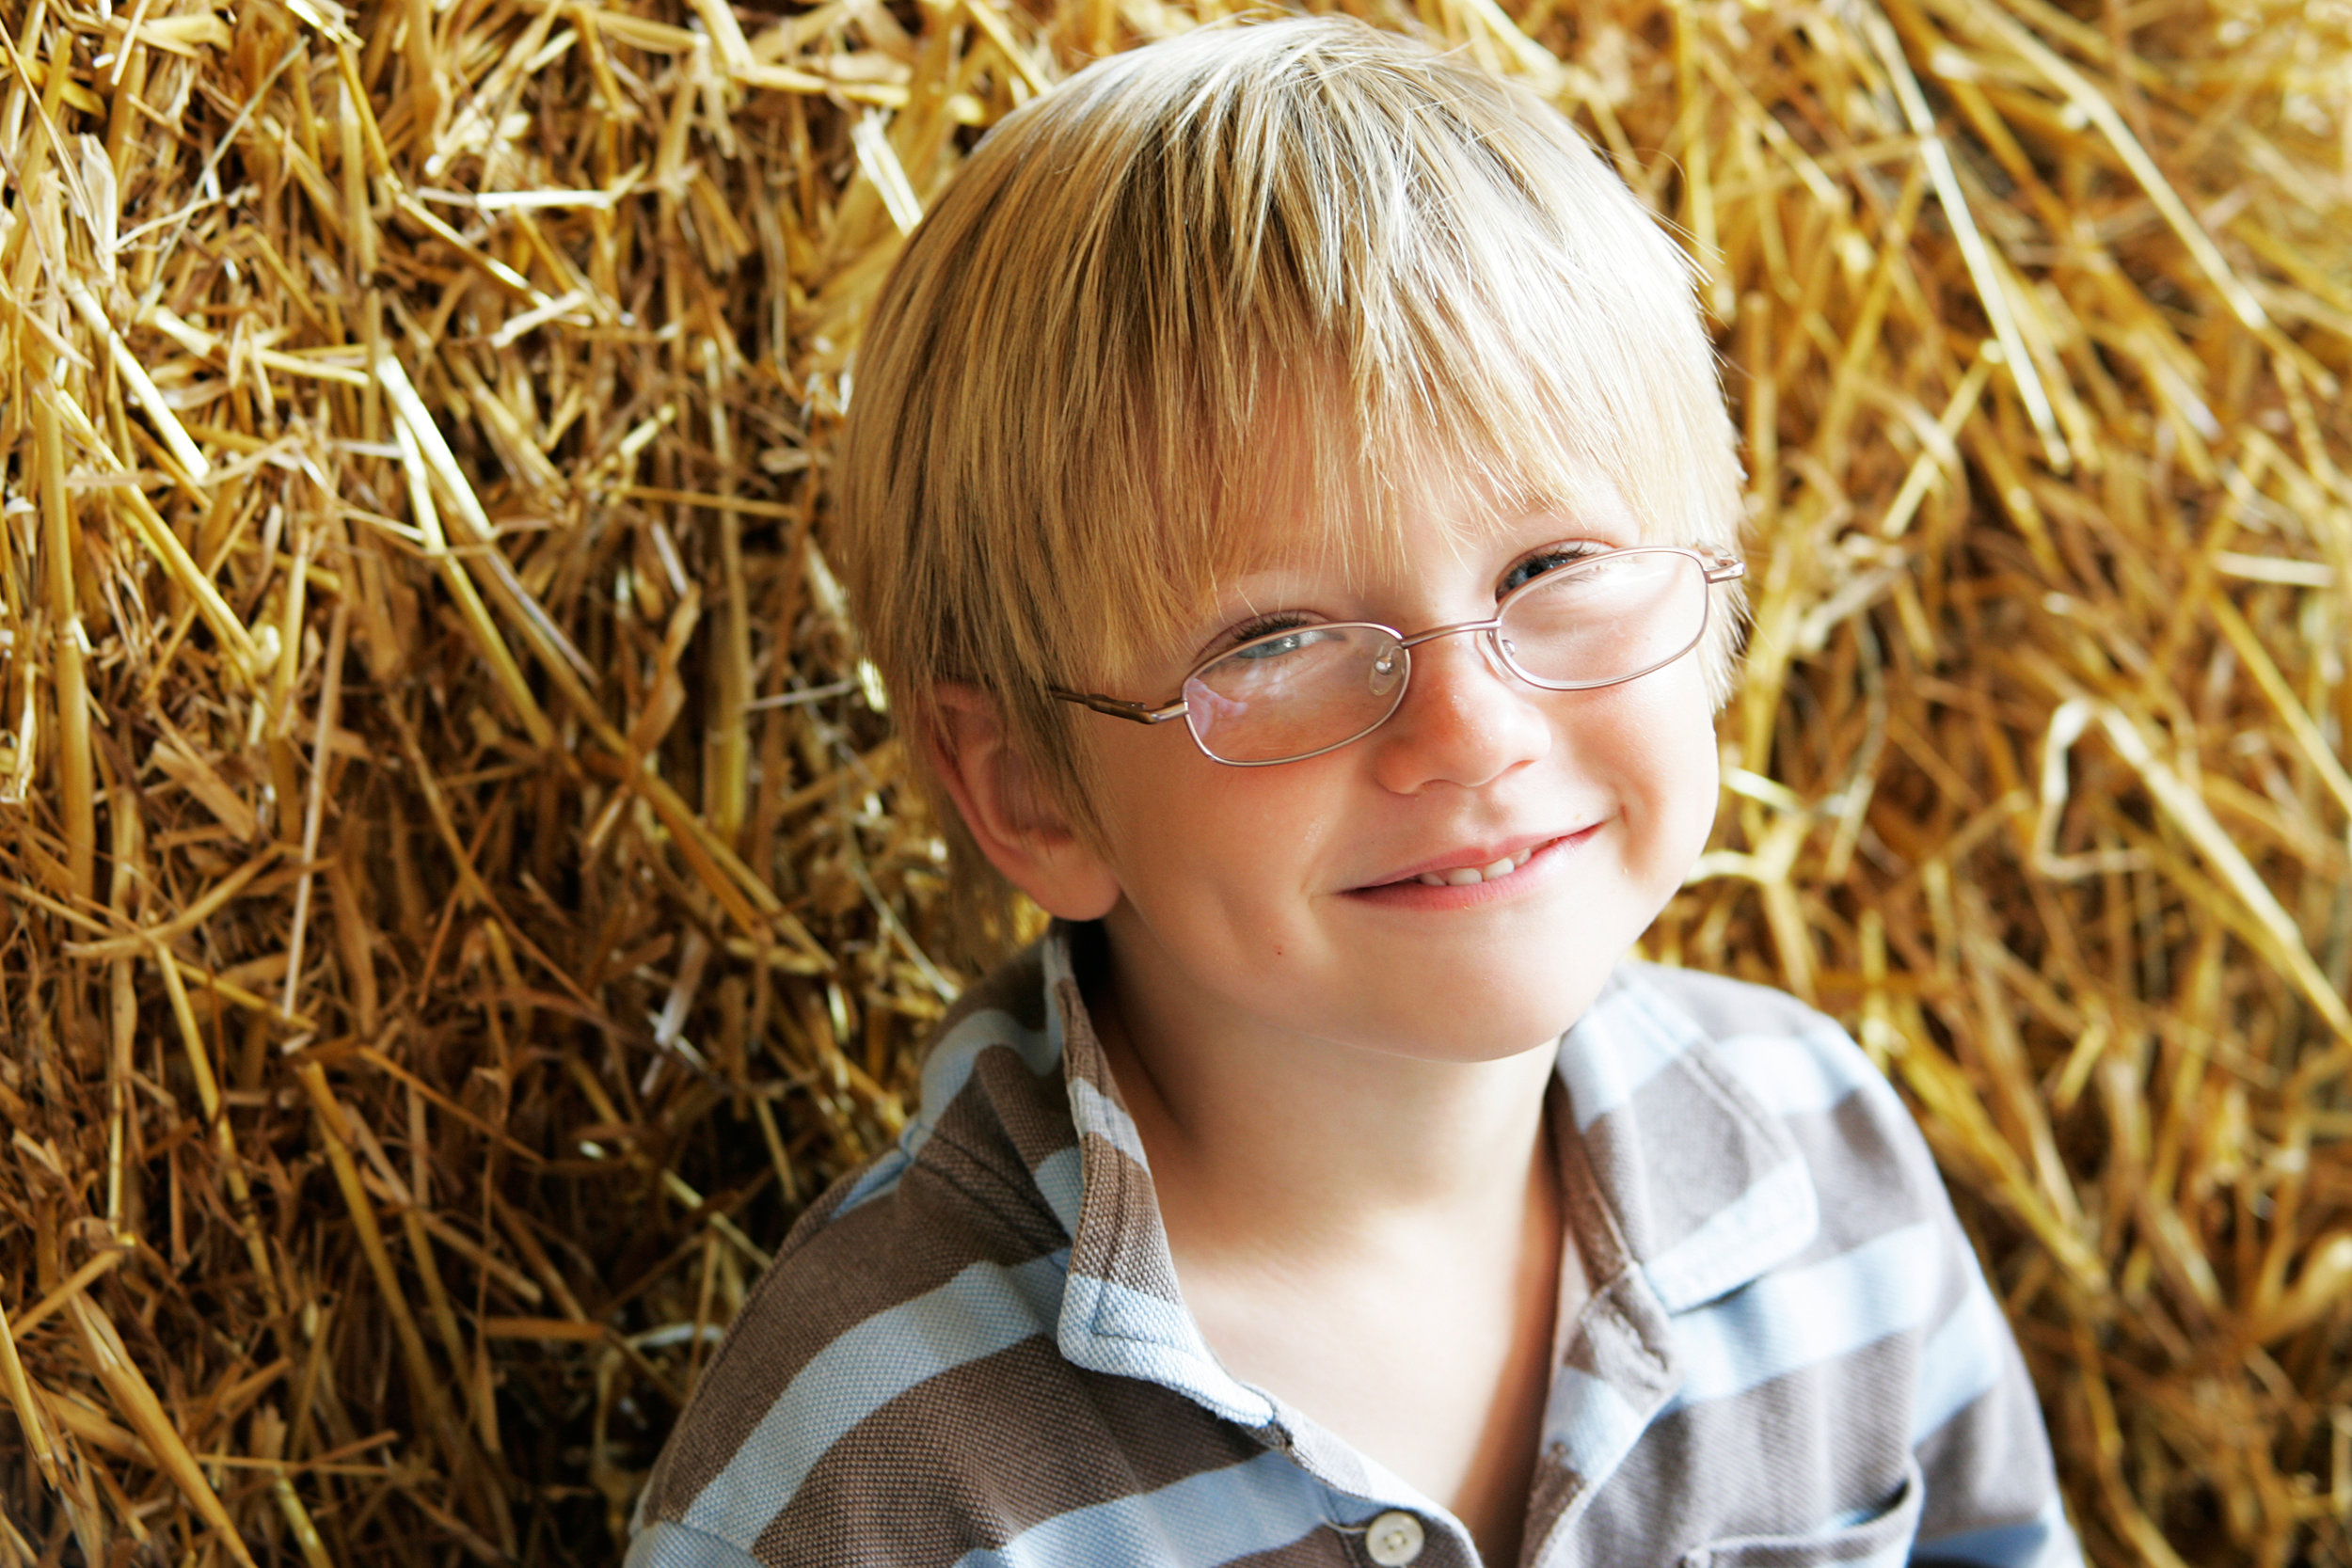 Kids-Portrait-Photography-Buckinghamshire008.jpg